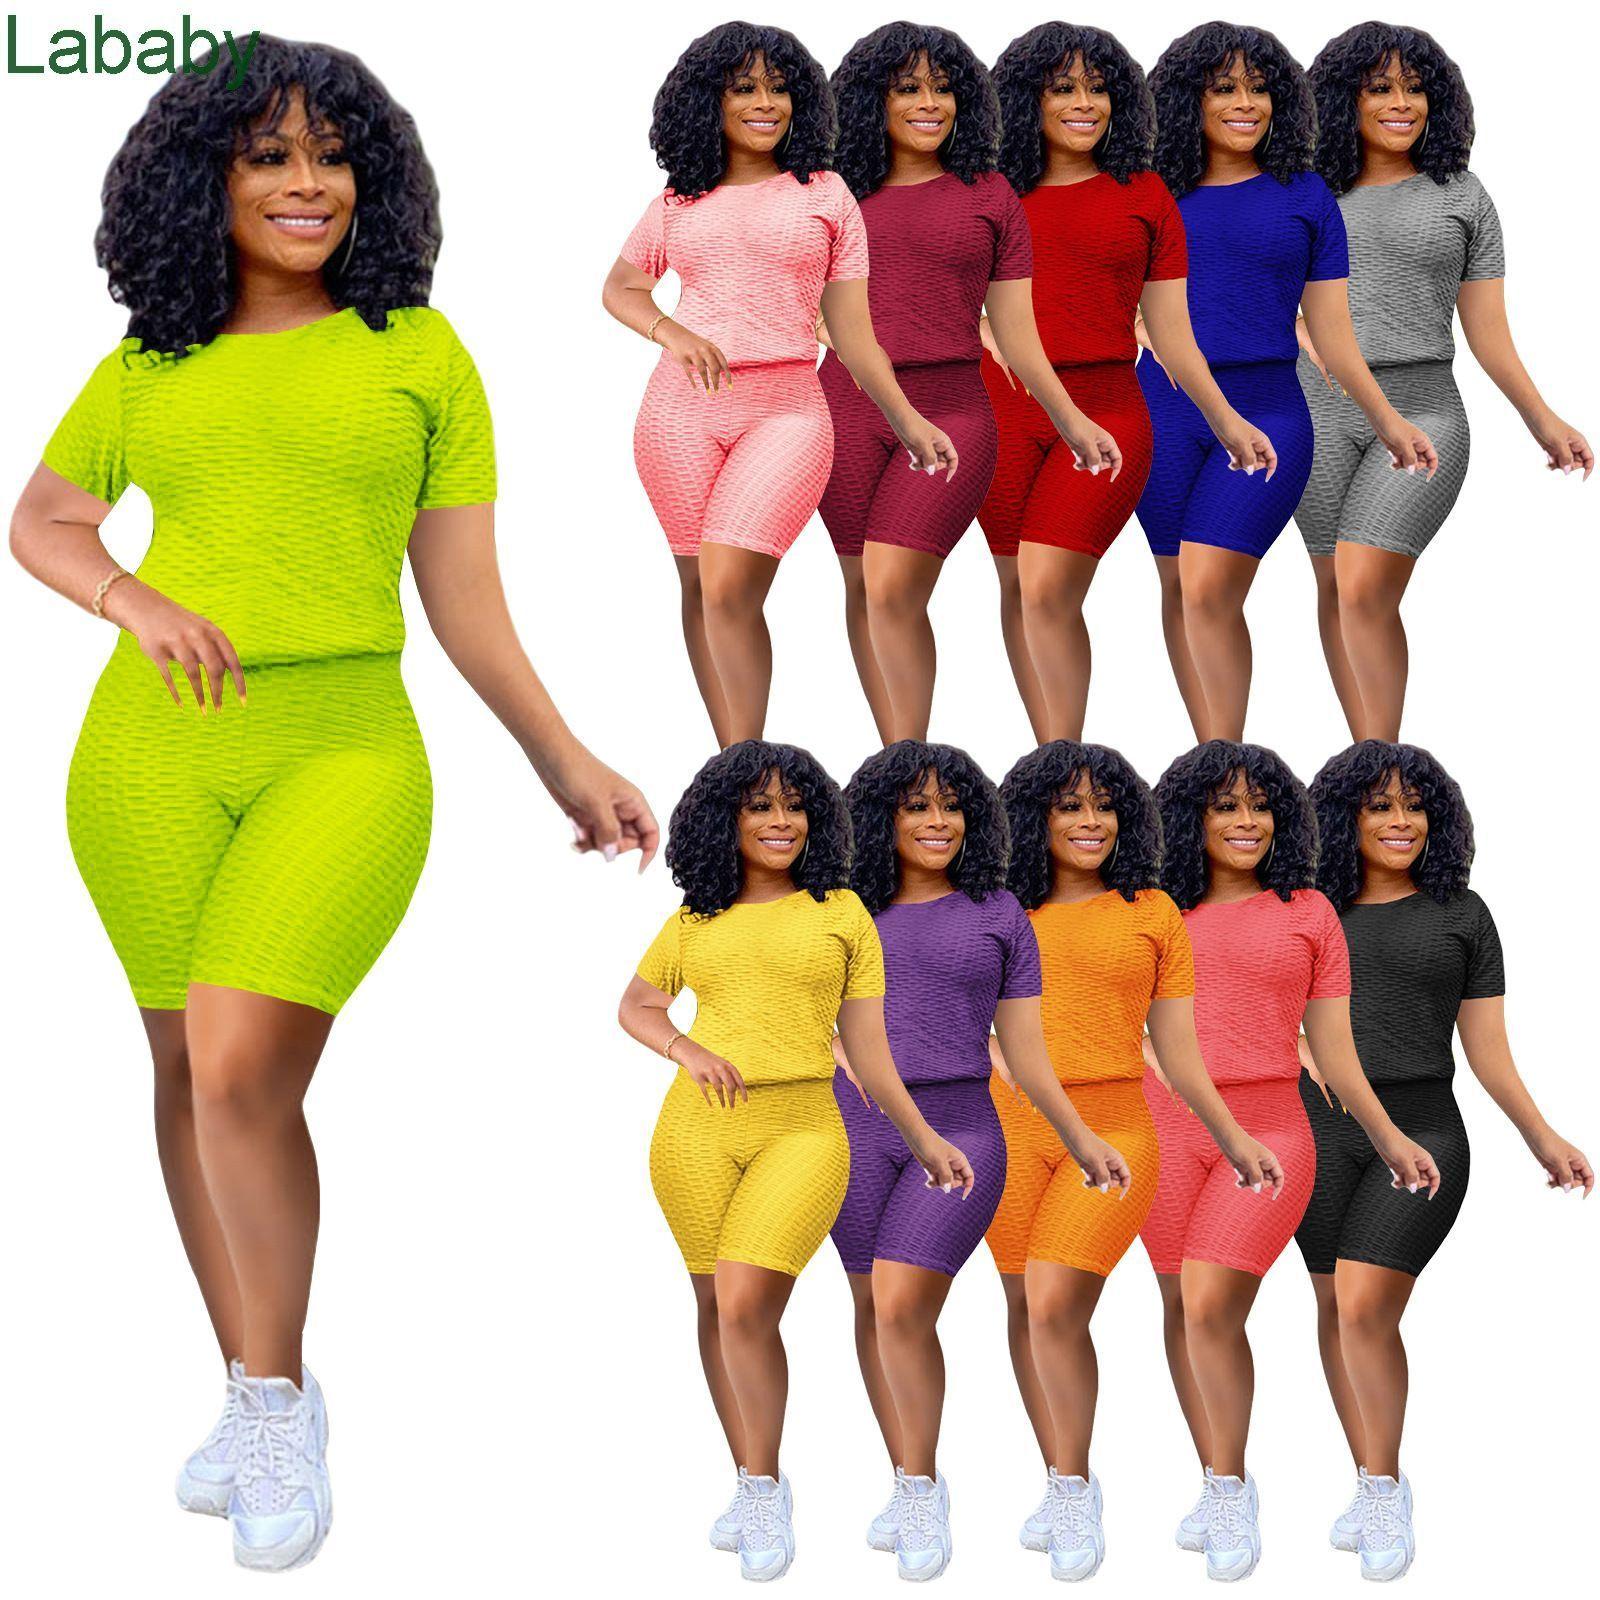 2021 Summer Women Tracksuit 2 Pcs Yoga Outfits Designer Short Sleeve T-shirt Shorts Solid Color Sportswear Joggers Suit Clothes Plus Size